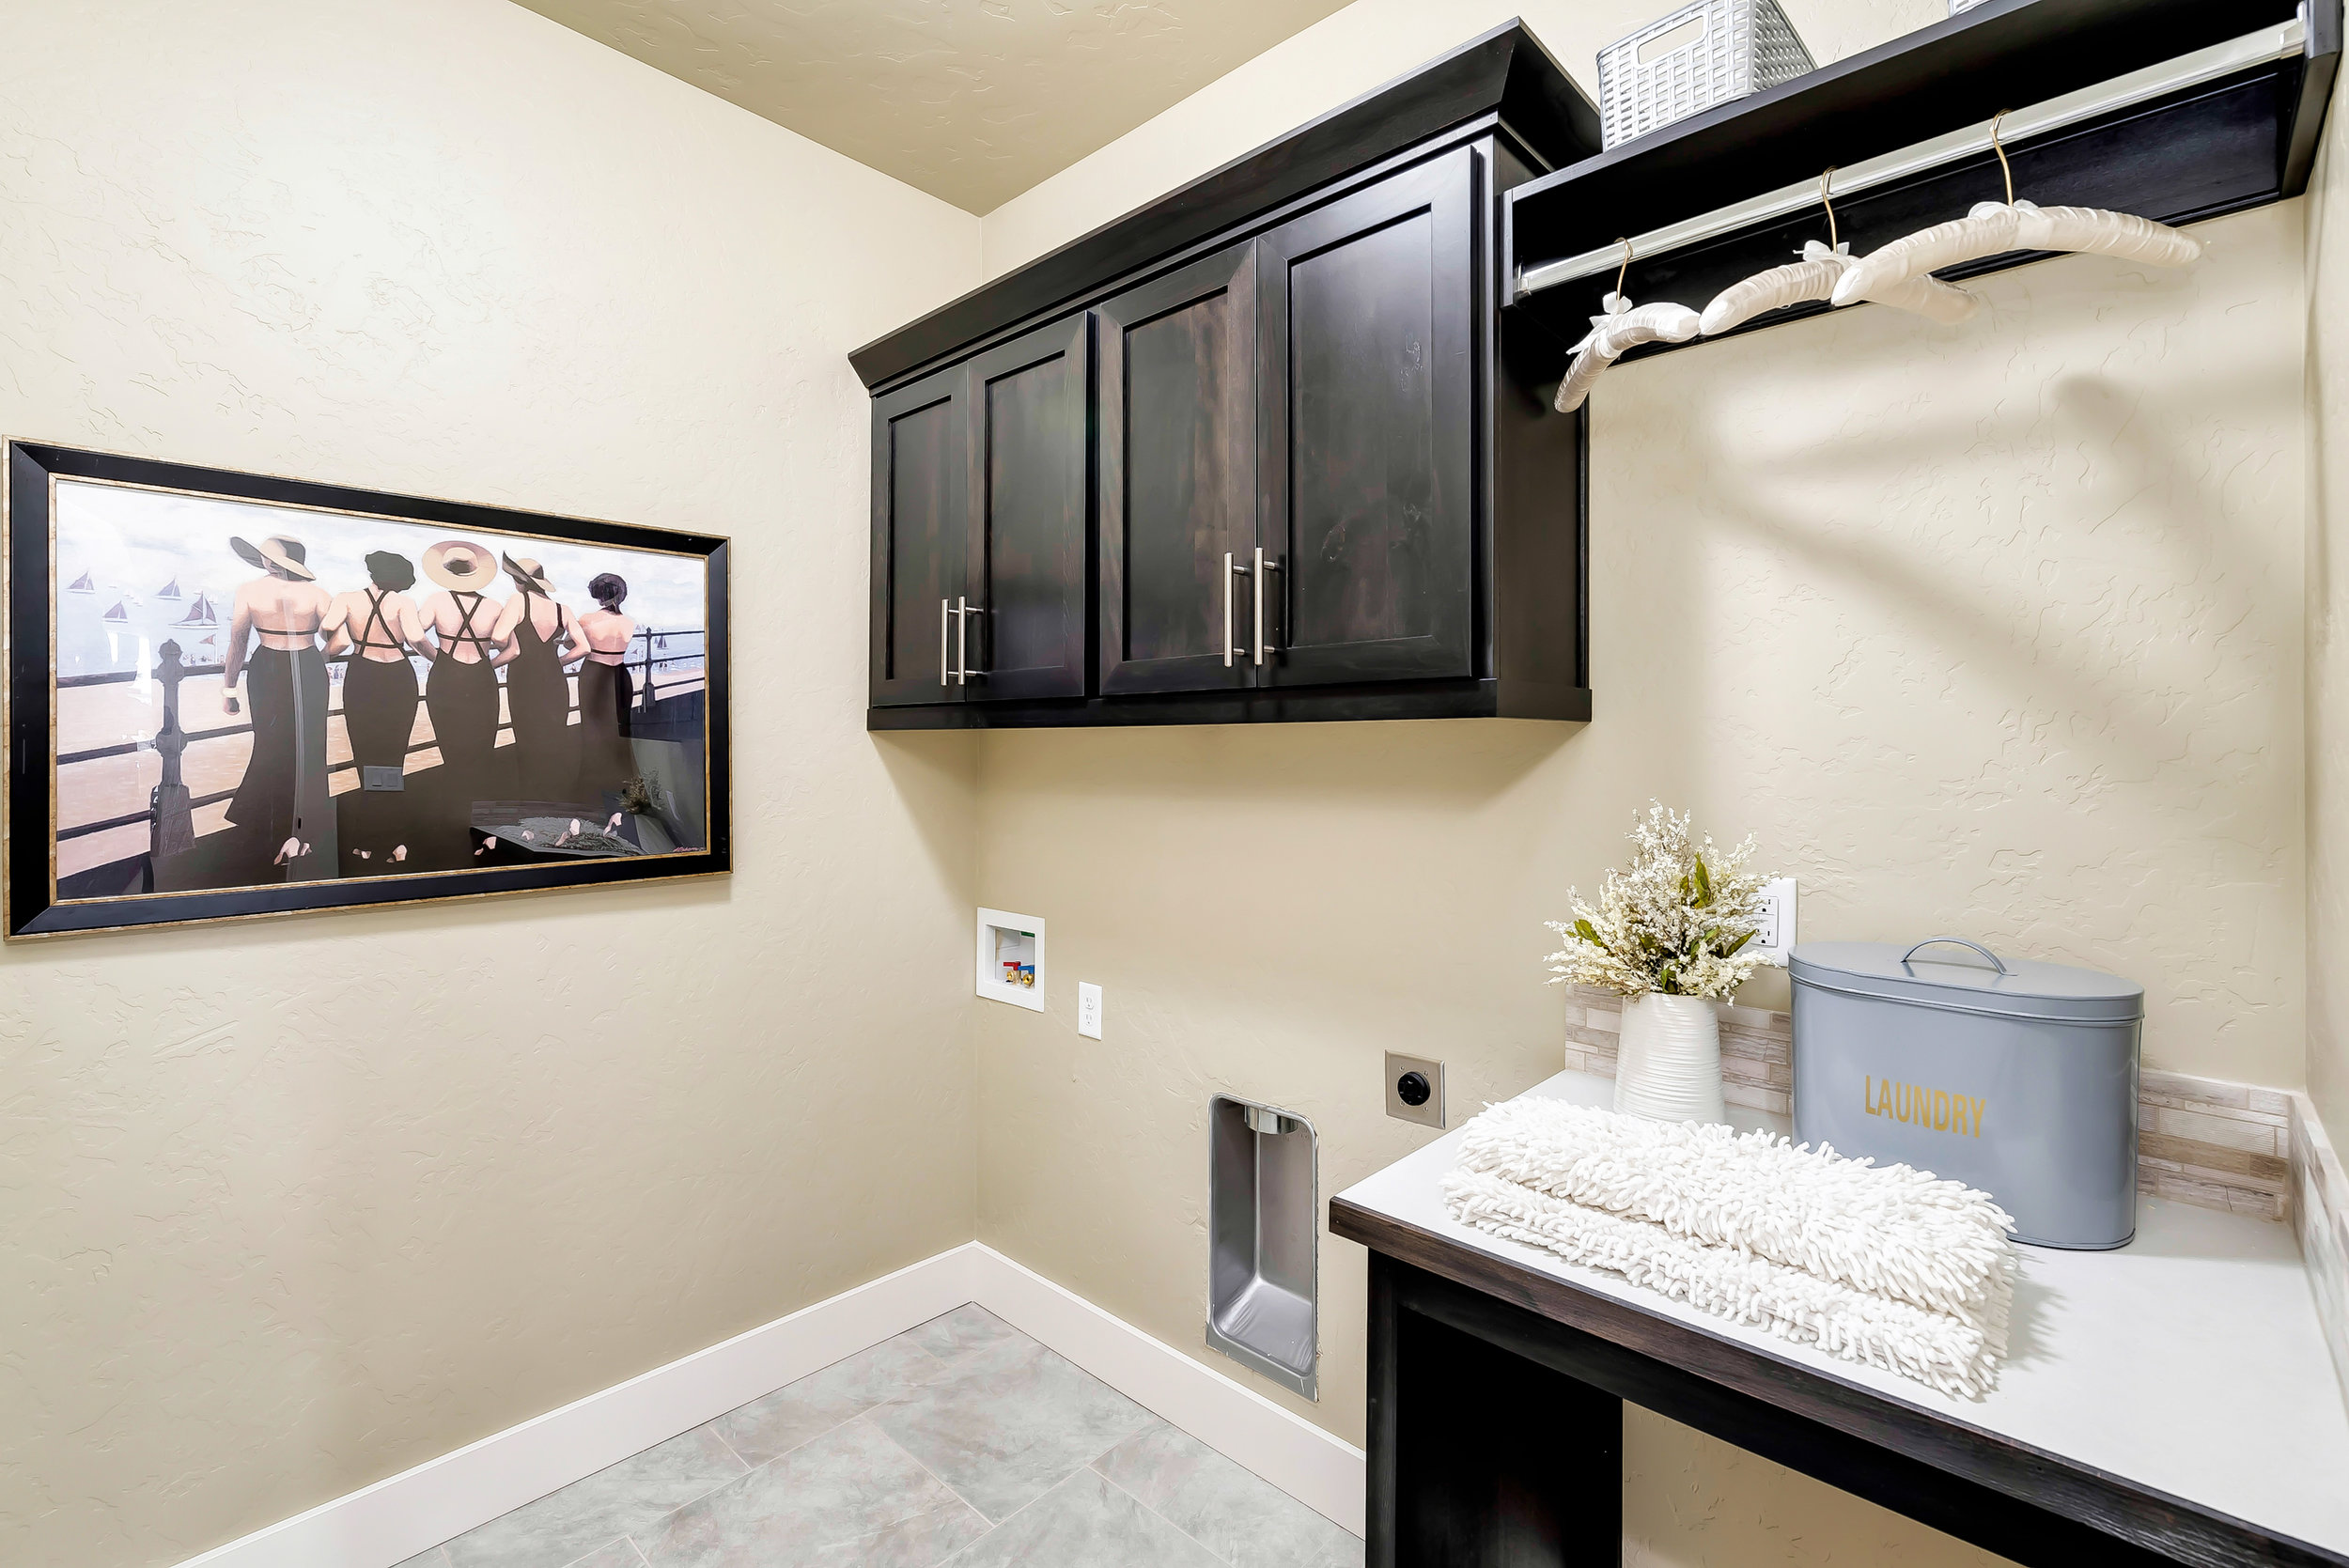 19-Laundry_Room.jpg